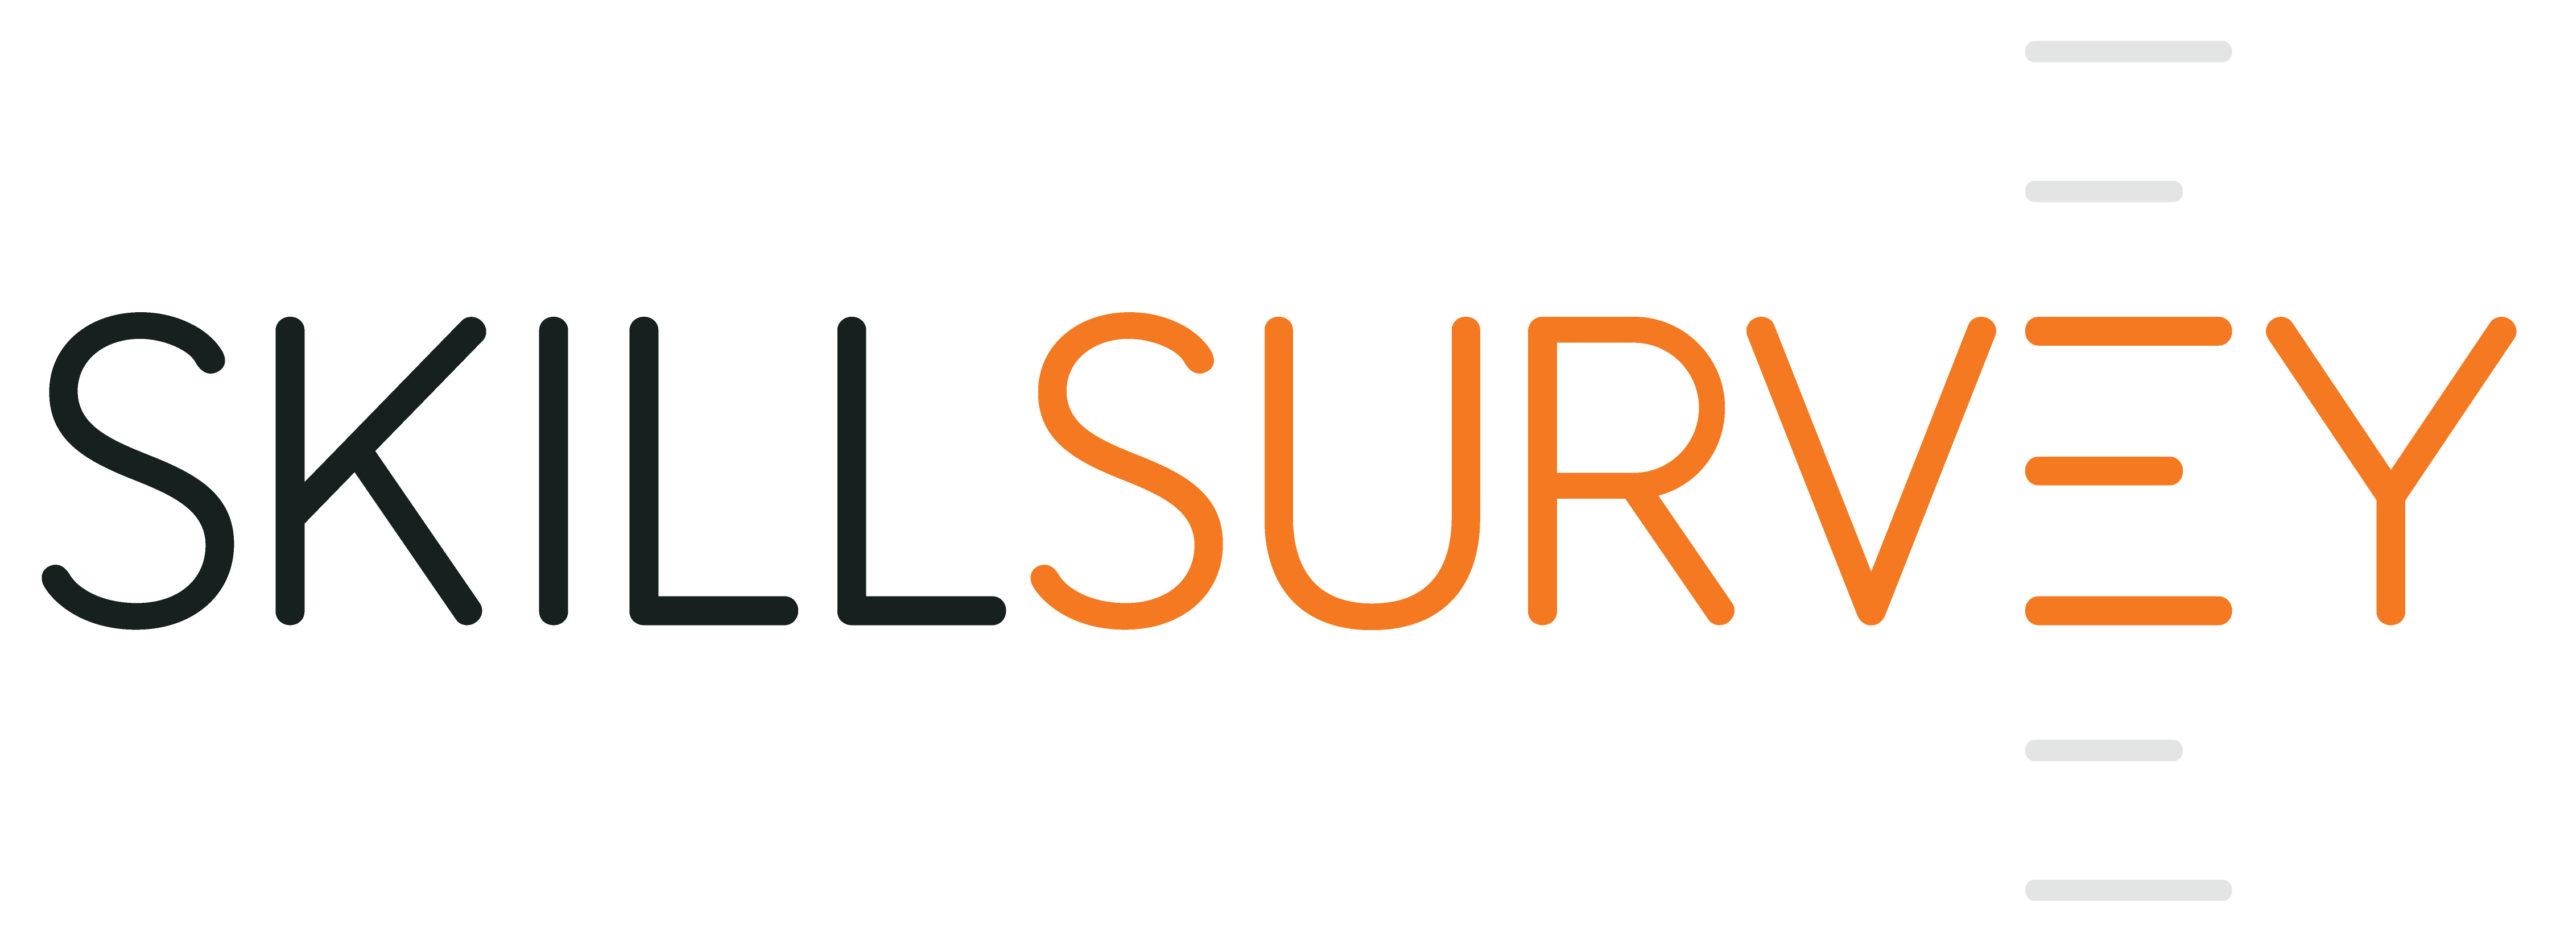 SkillSurvey-Logo-forWhiteBackgrounds-COLOR